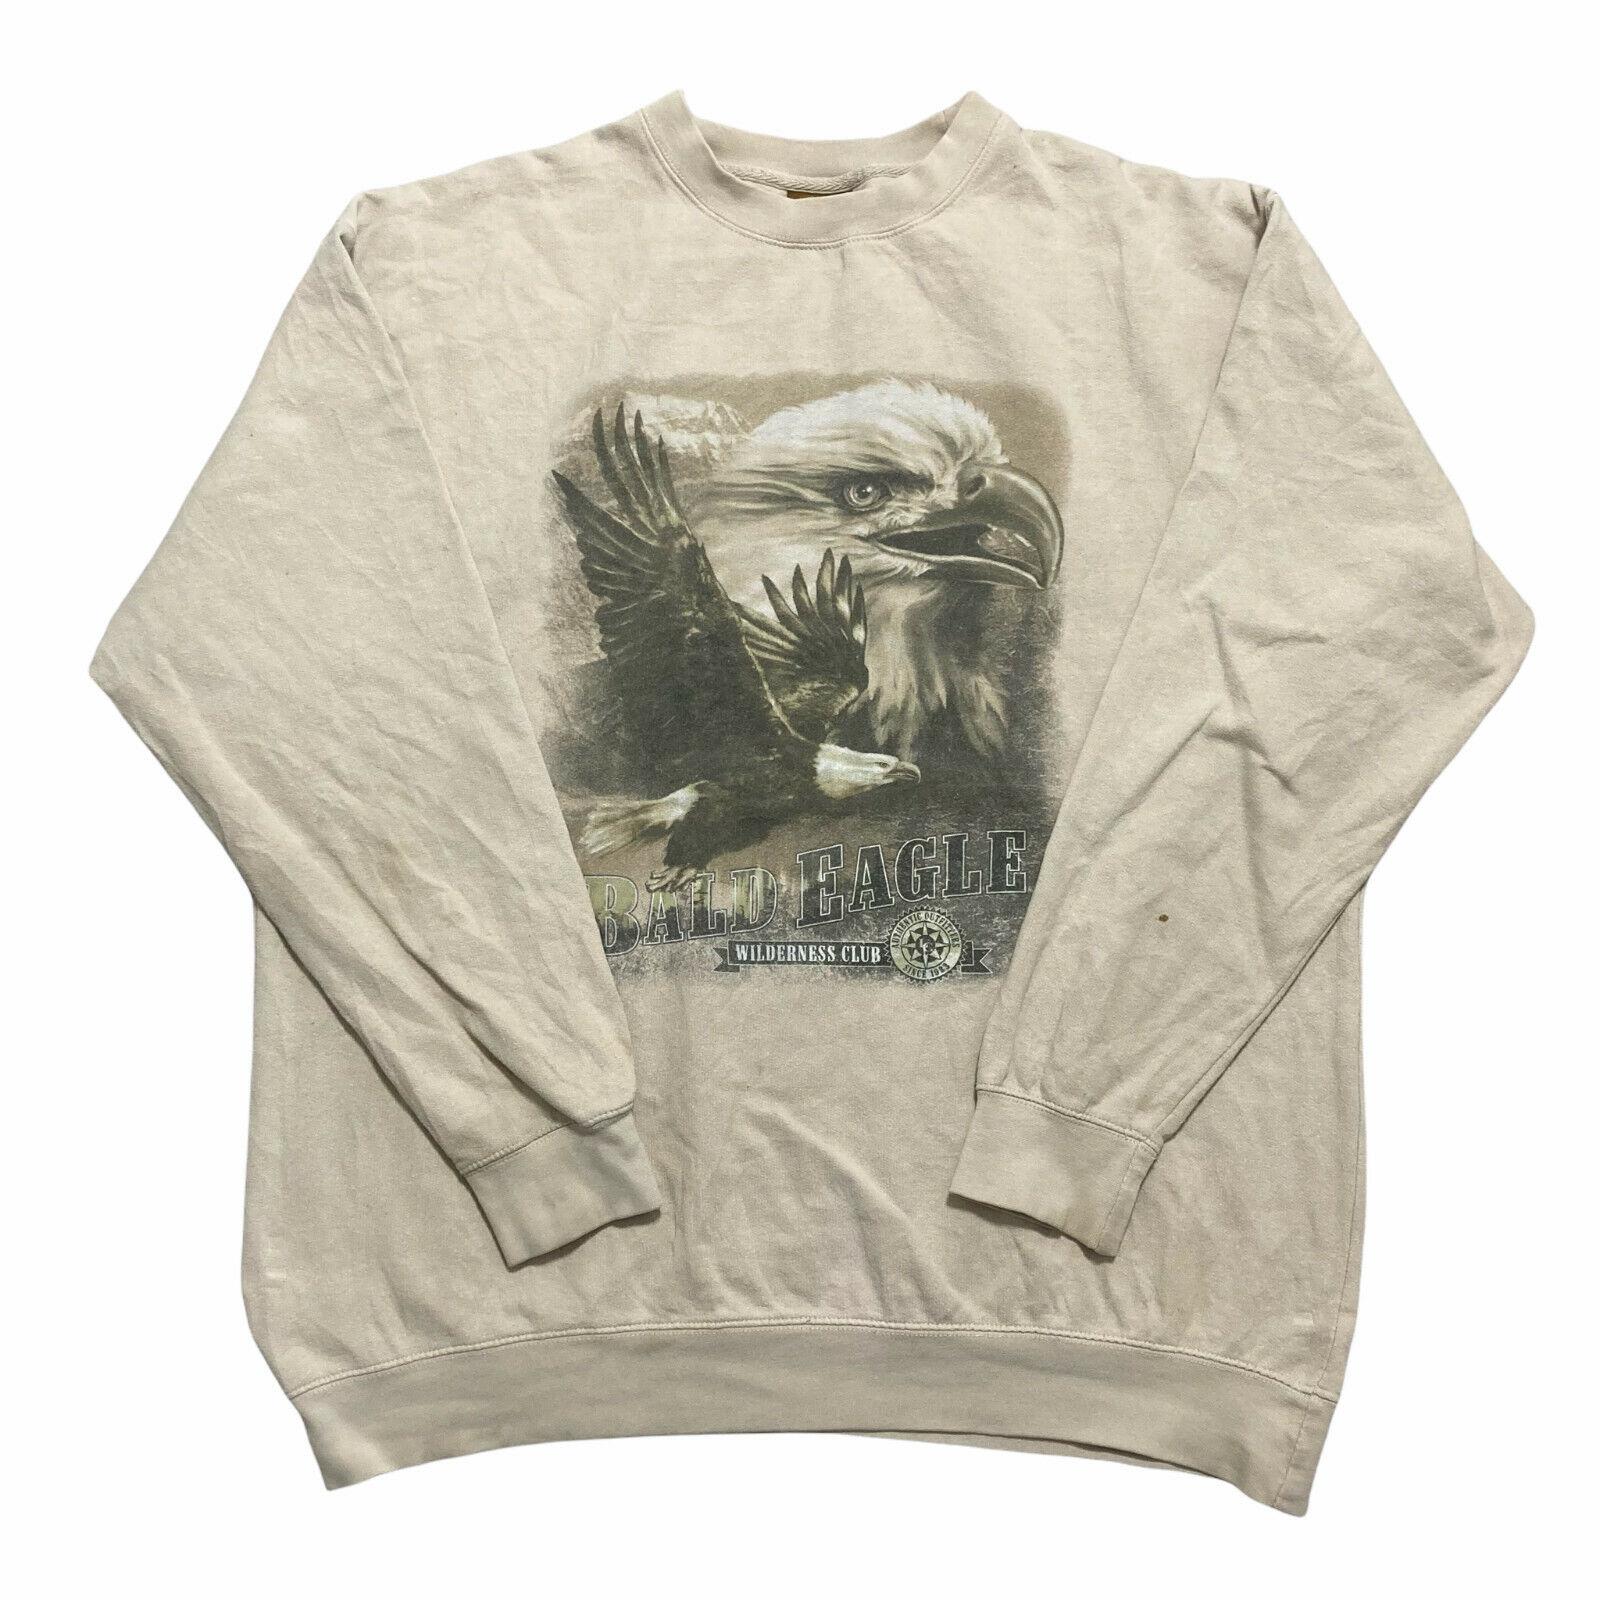 Vintage American Outdoors Mens Sweatshirt Bald Eagle Wilderness Jumper Size 2XL